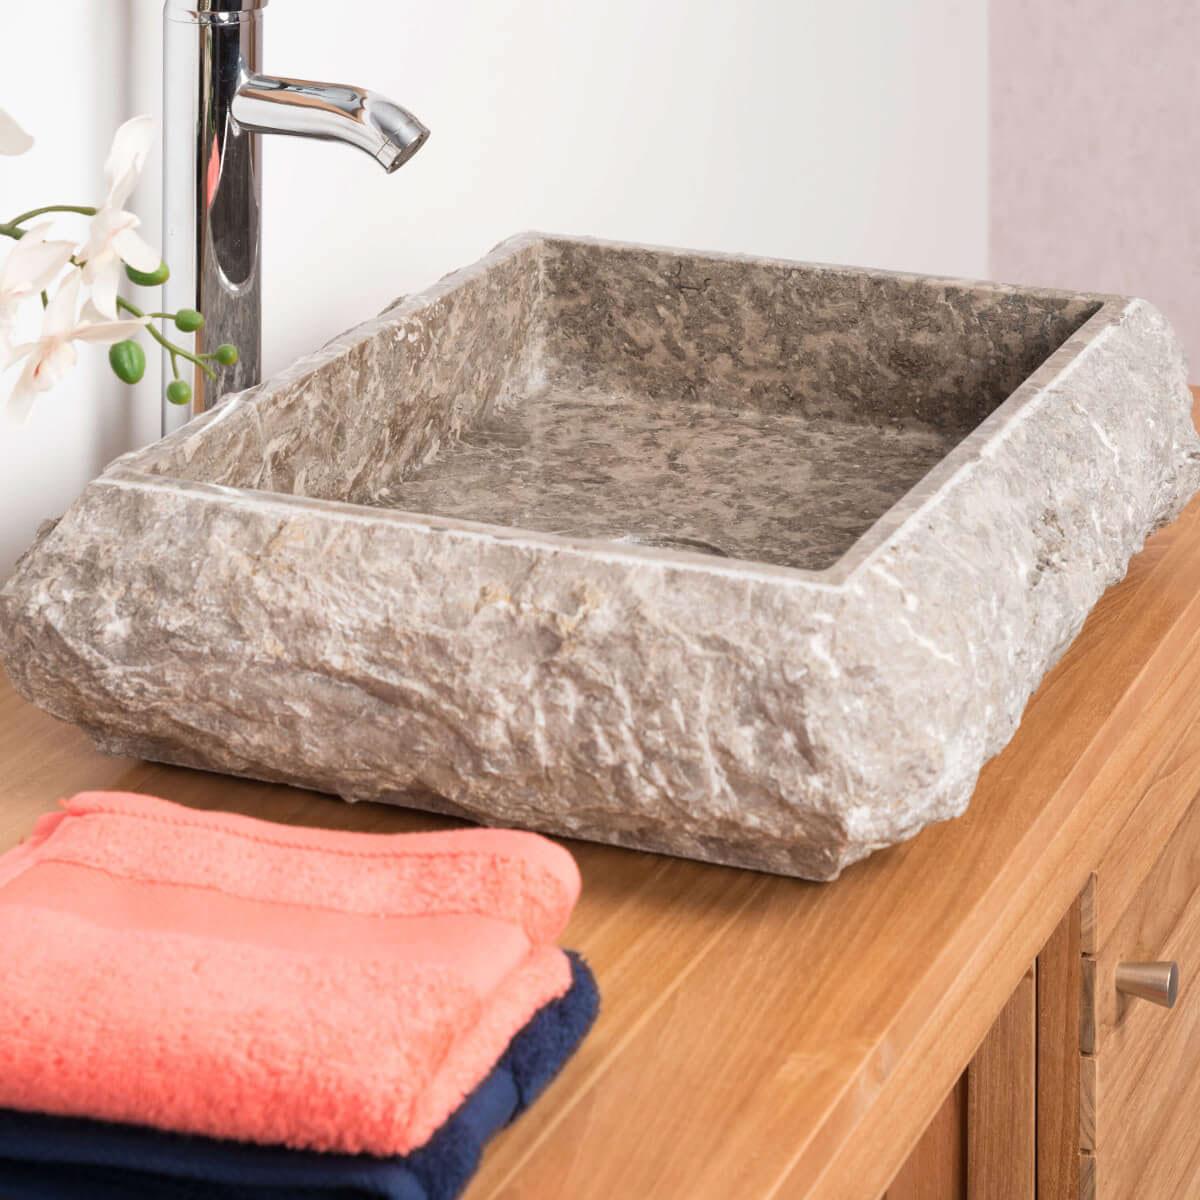 vasque poser en marbre naples rectangle grise taupe d 50 cm. Black Bedroom Furniture Sets. Home Design Ideas